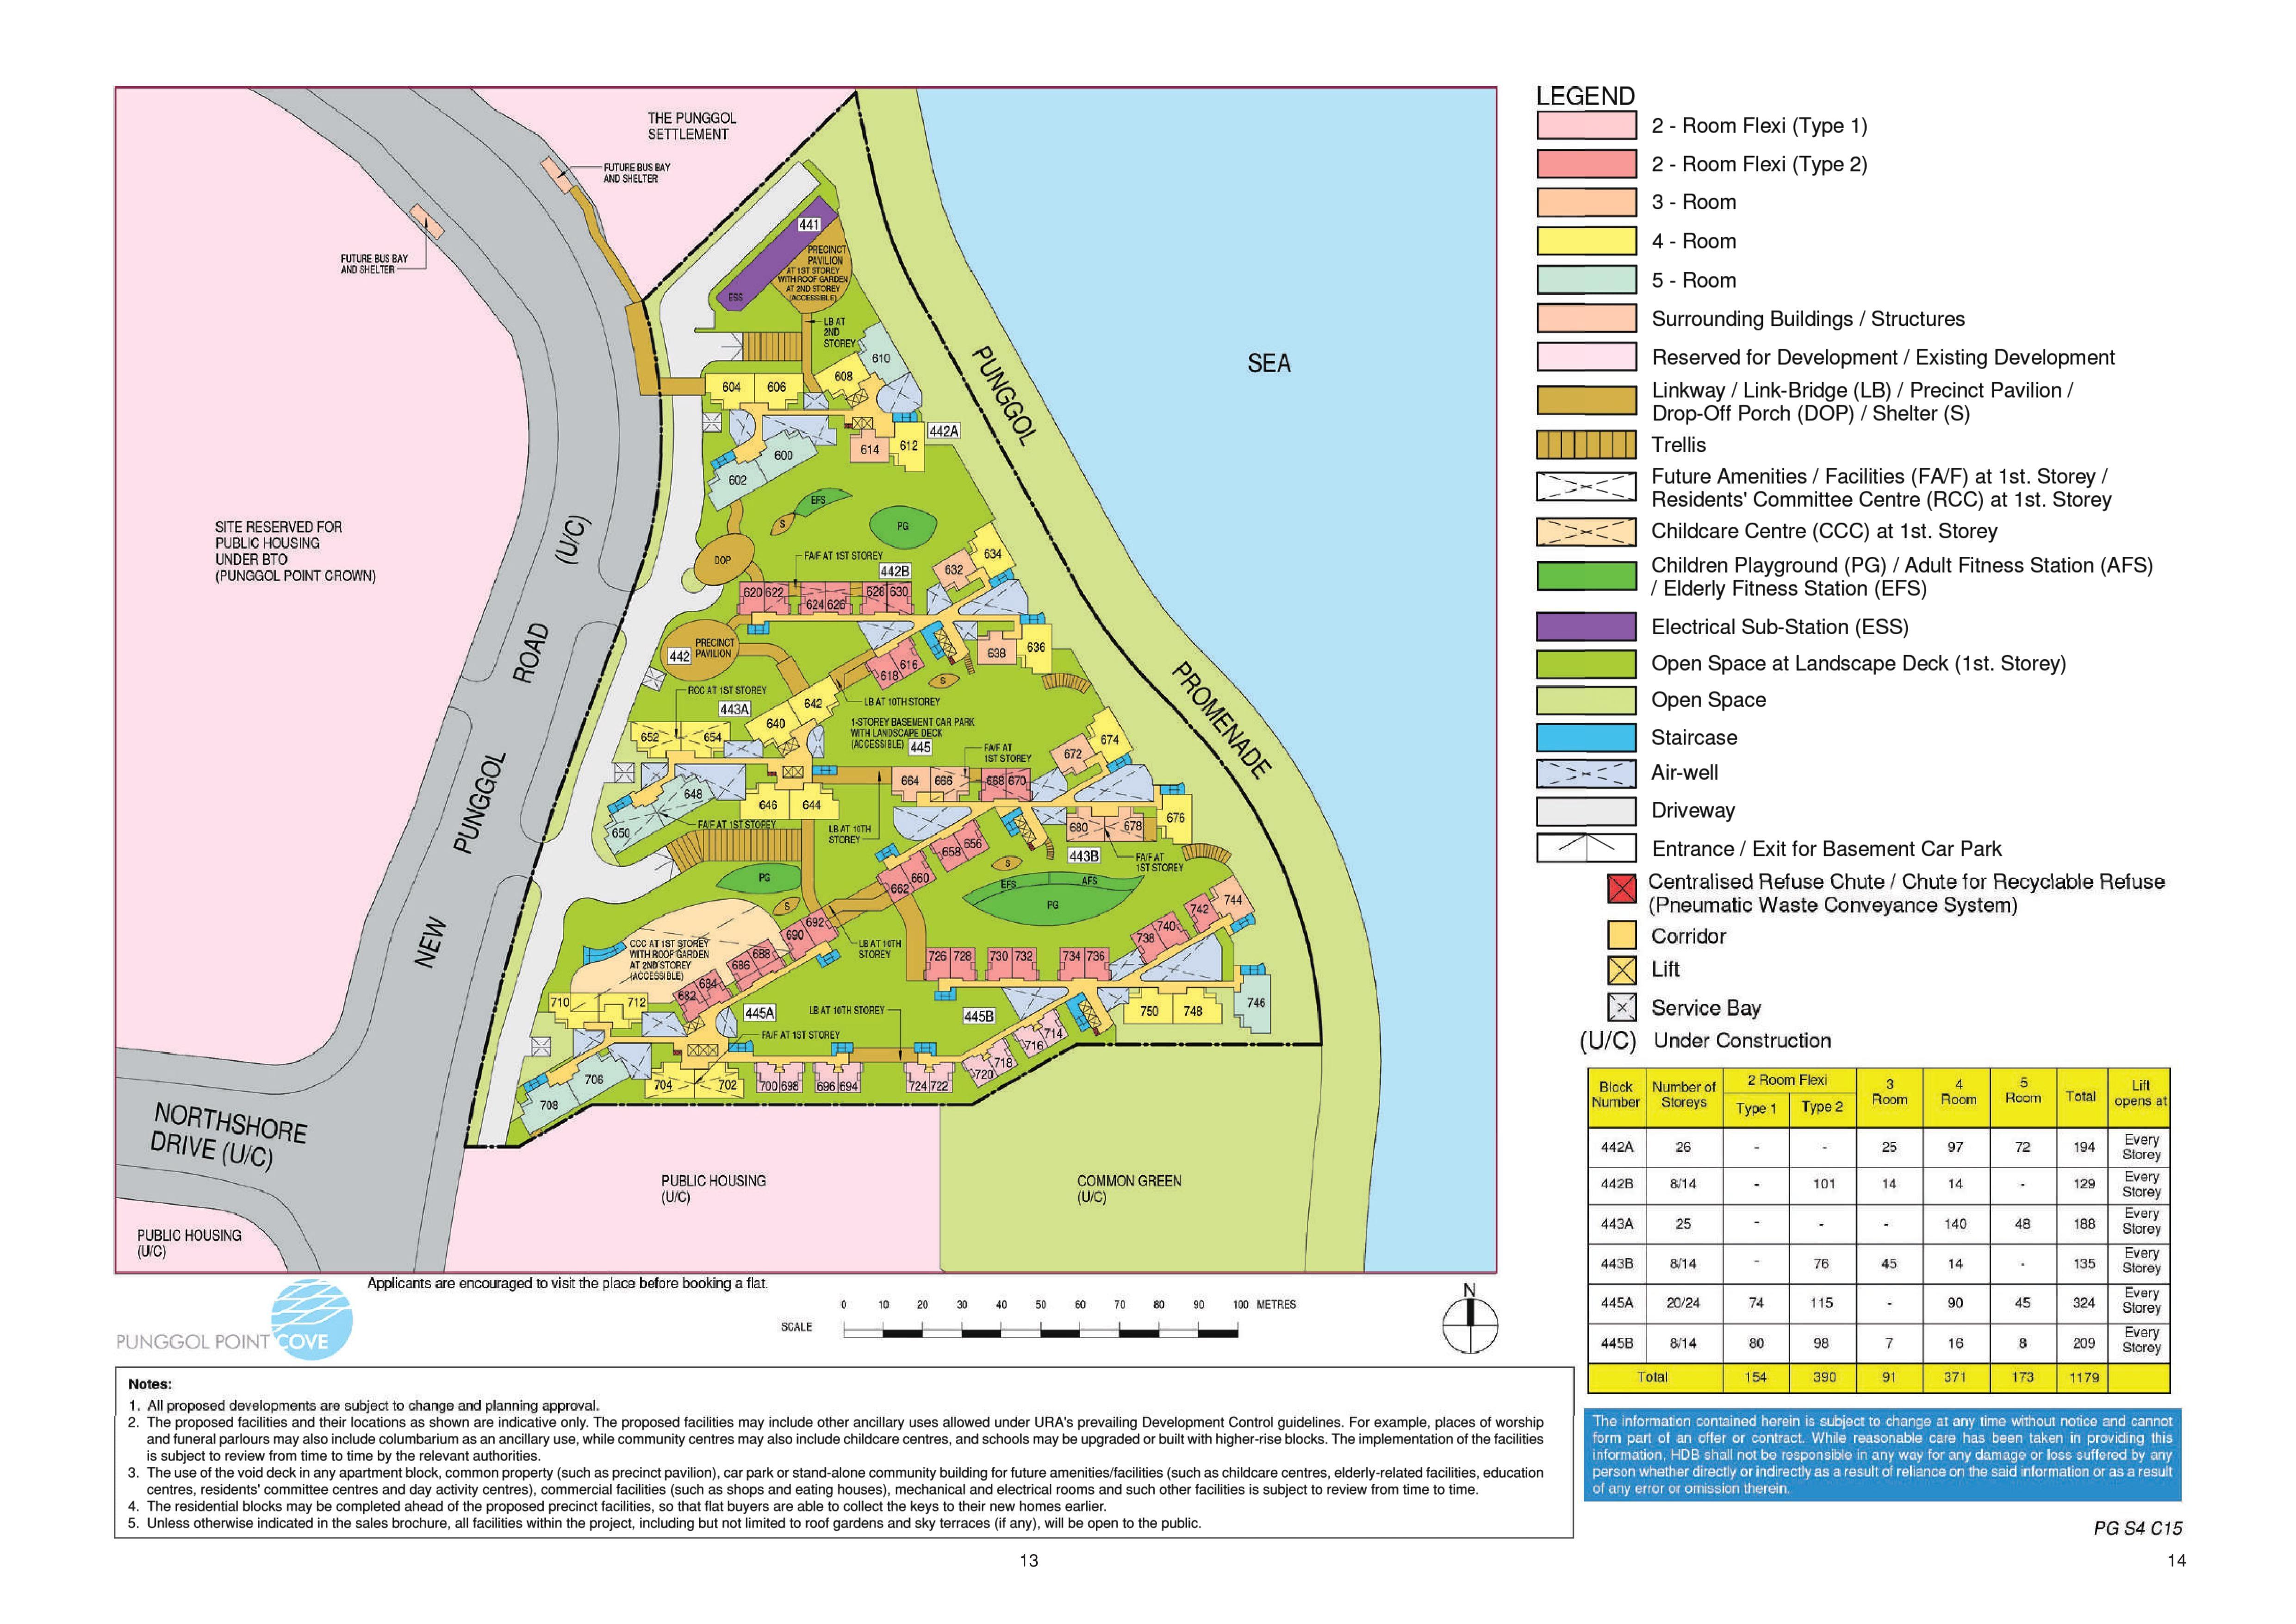 Punggol Point Cove (Sep) Site Plan